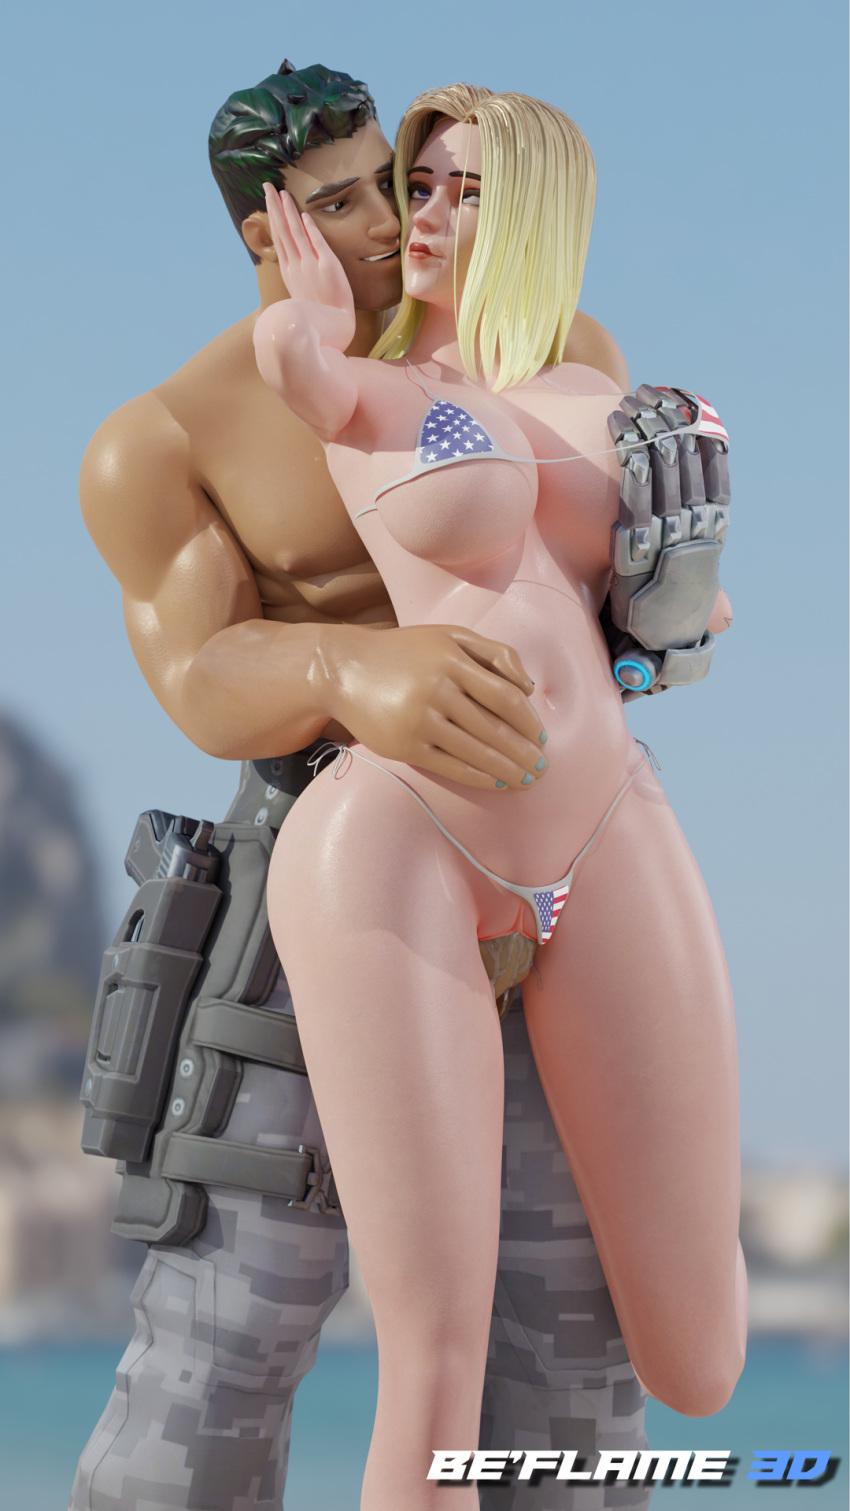 ashe-porn-hentai-–-blonde-hair,-short-hair,-curvy,-american-flag-bikini.